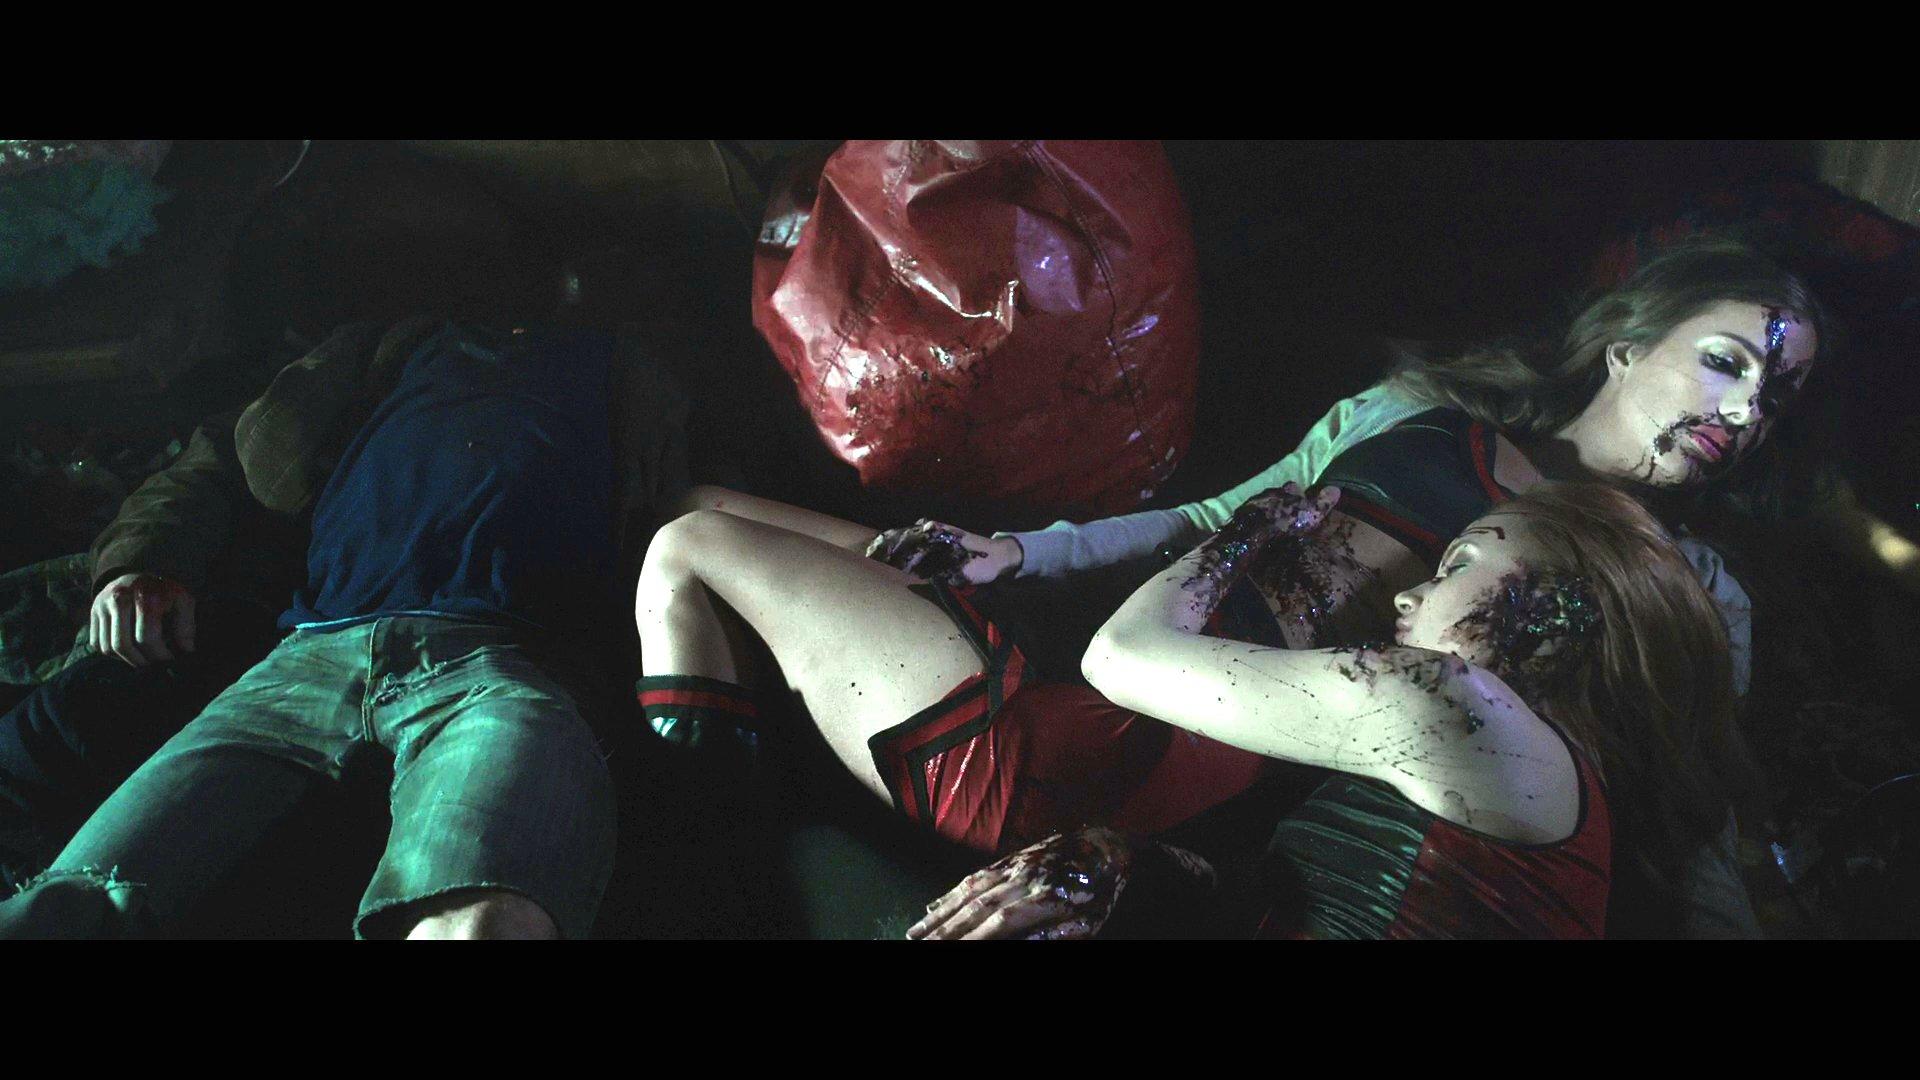 full-horror-sexy-movie-germani-xxx-girls